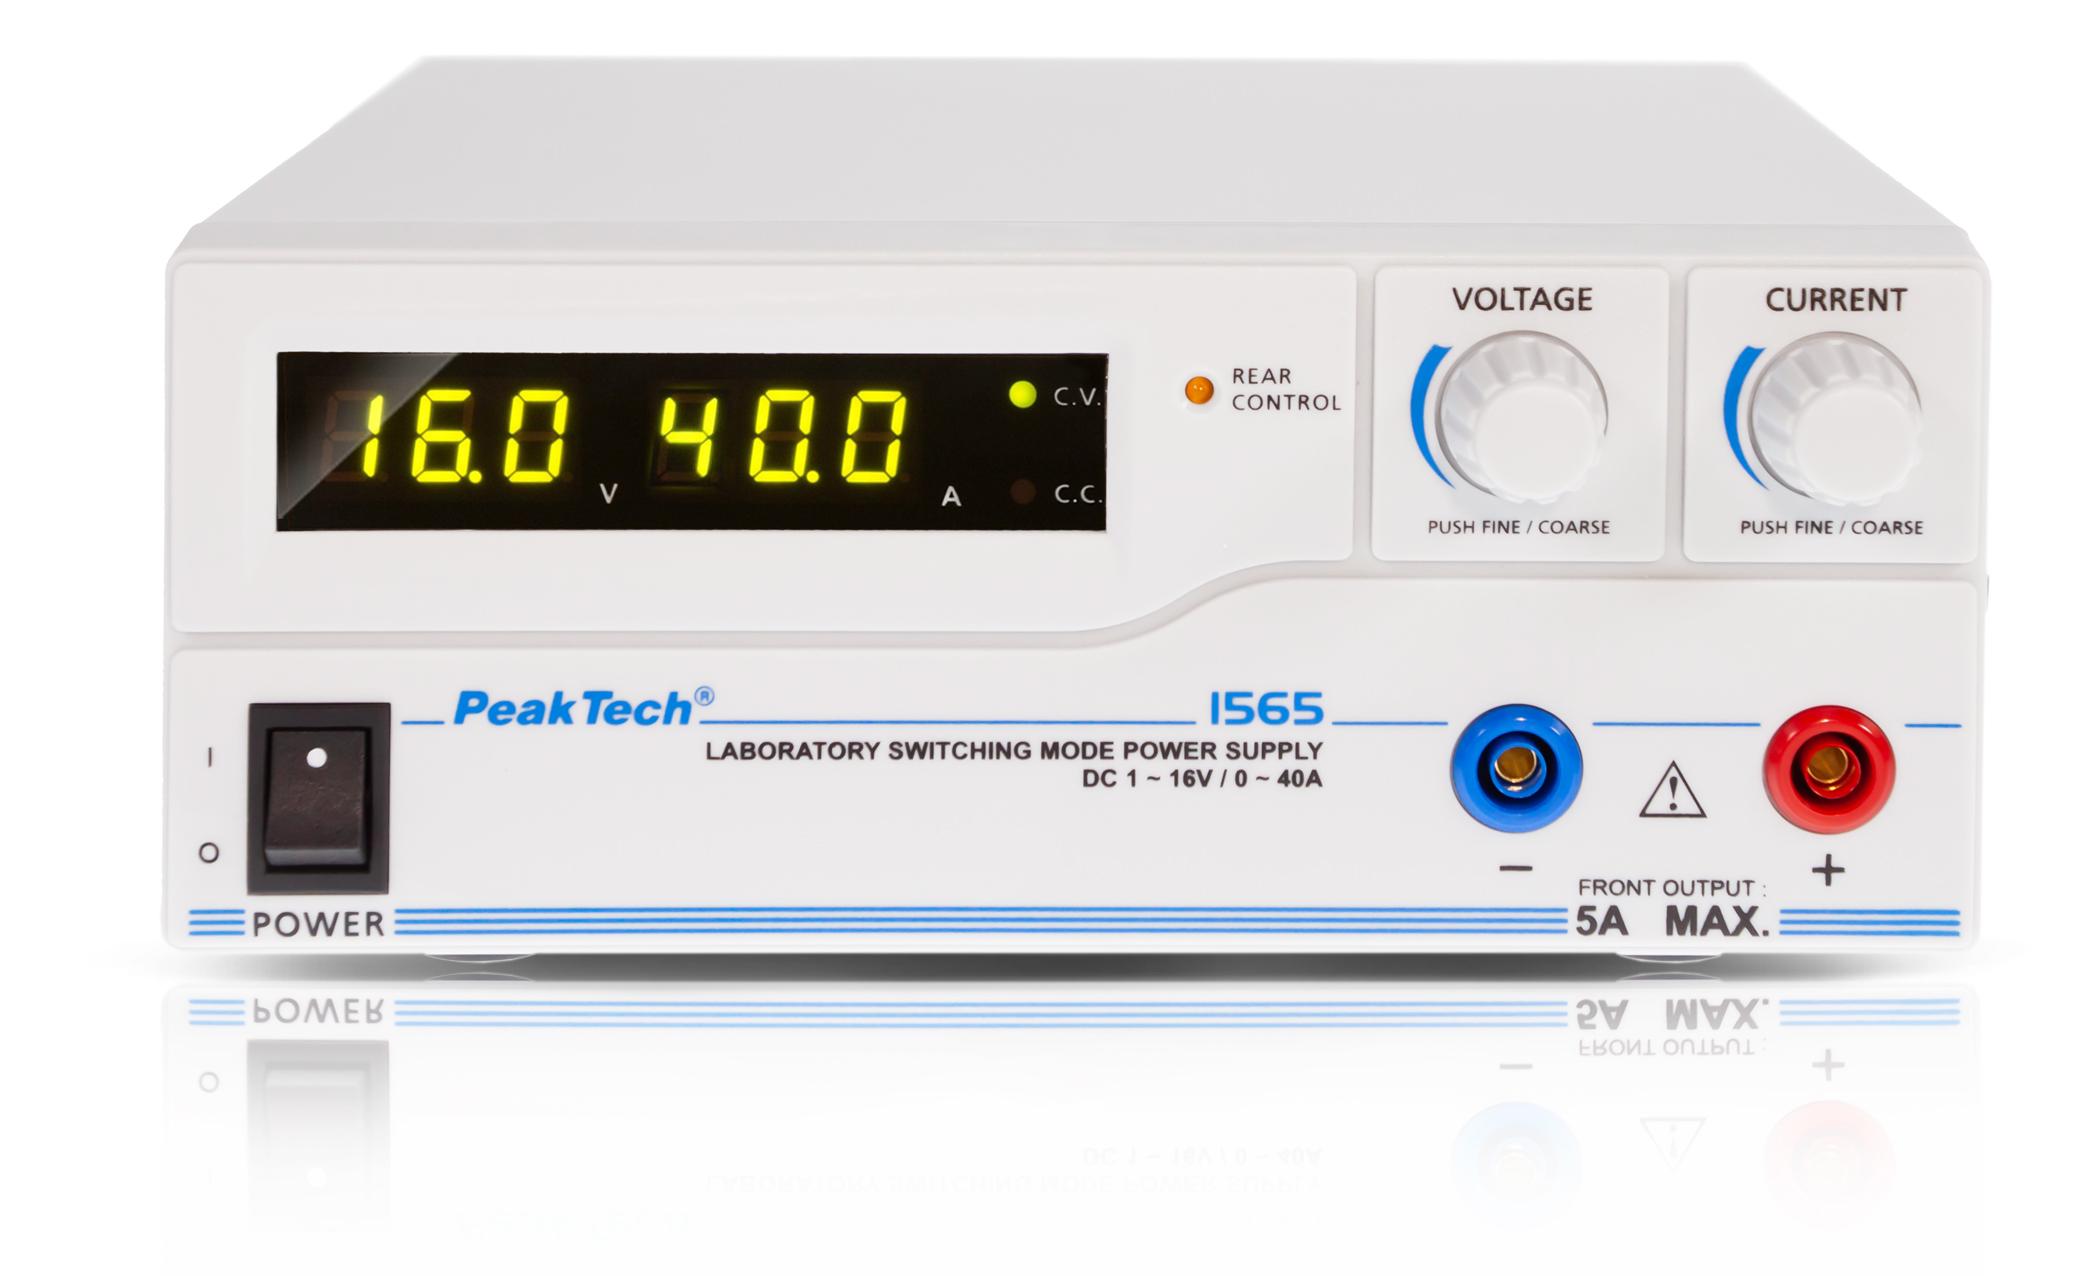 «PeakTech® P 1565» Laboratory power supply DC 1 - 16V/0 - 40A & USB